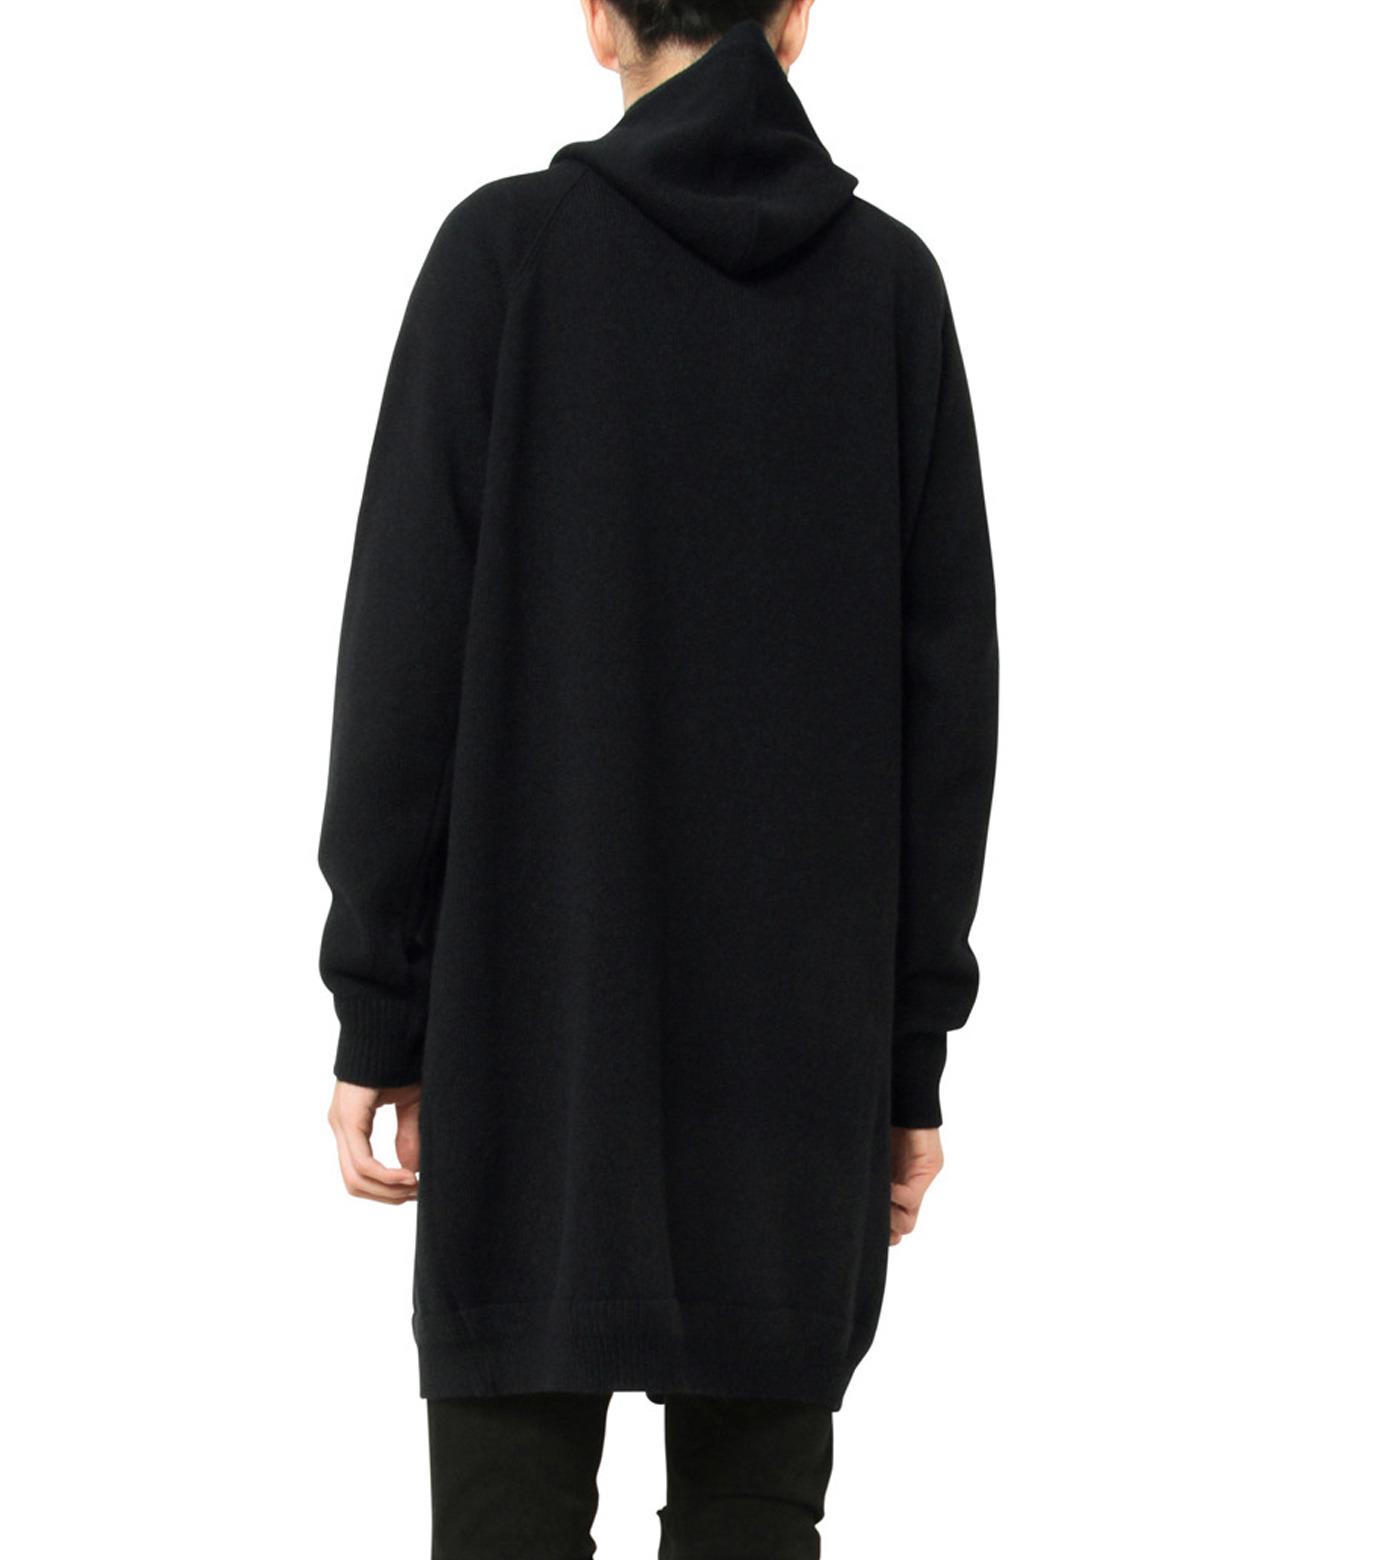 HL HEDDIE LOVU(エイチエル・エディールーヴ)のLONG KNIT PARKA-BLACK(ニット/knit)-17A91001-13 拡大詳細画像6